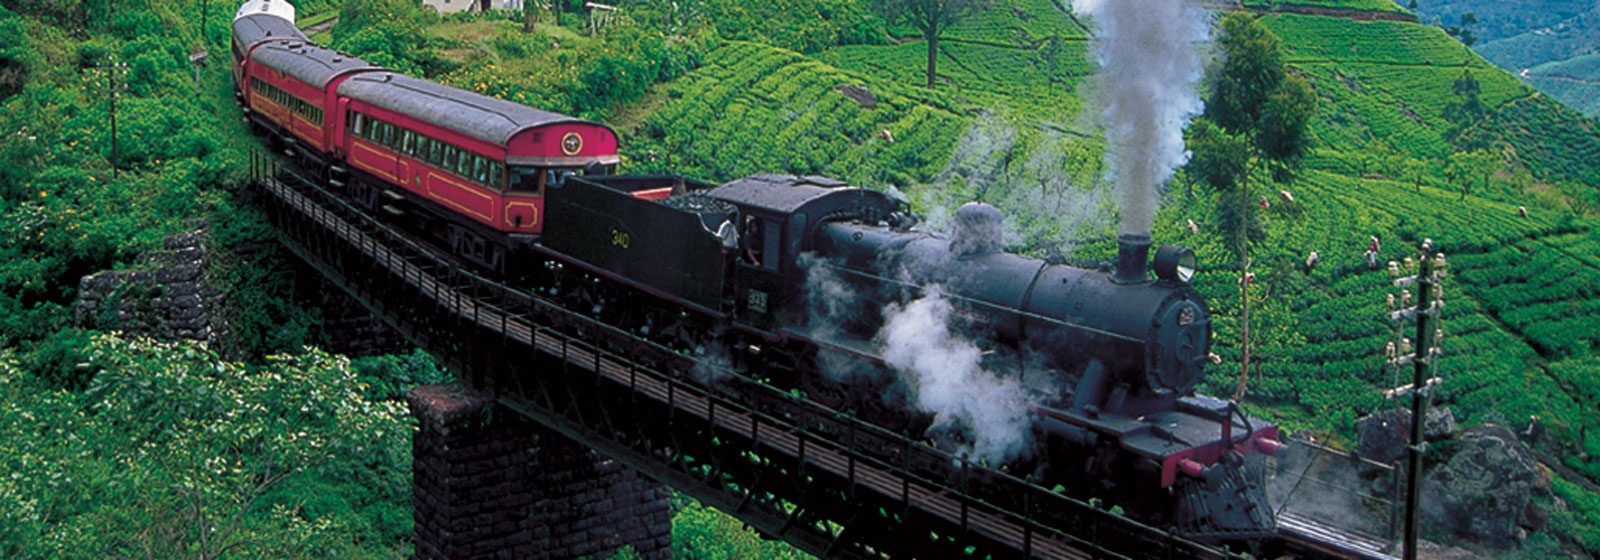 Sri Lanka Travel and Tourism